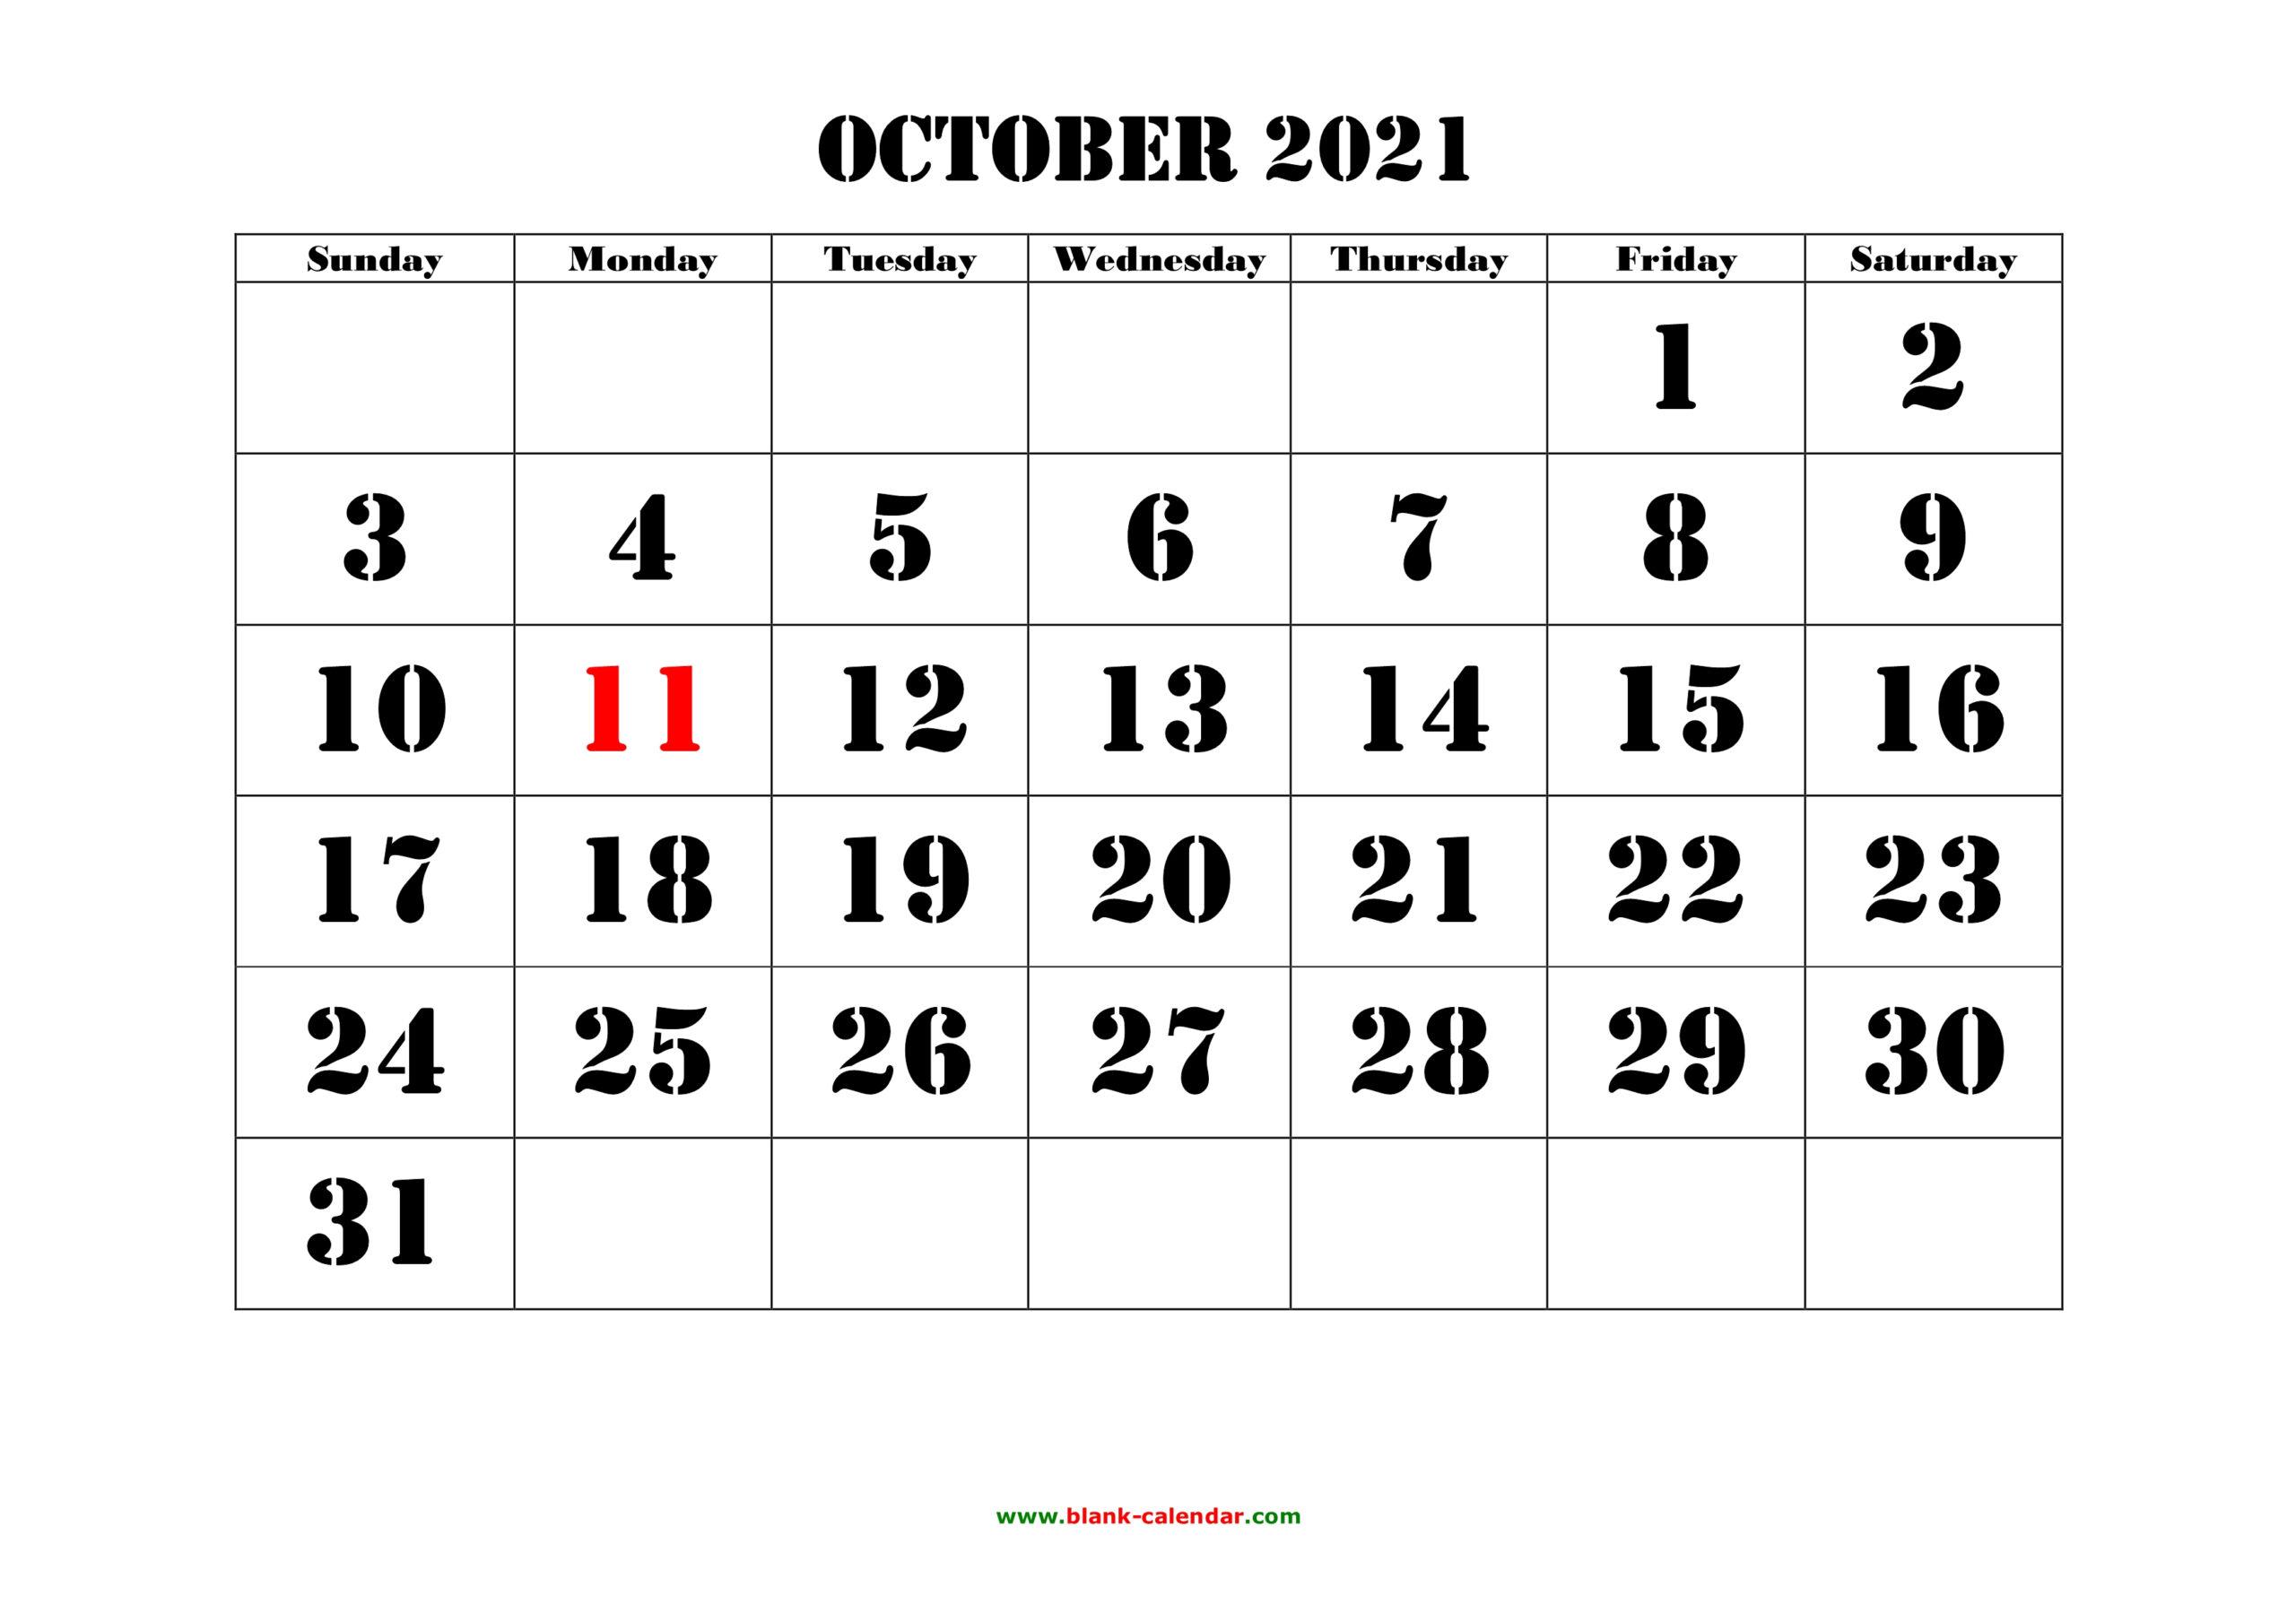 Calendar October 2021 Google Docs | Printable March